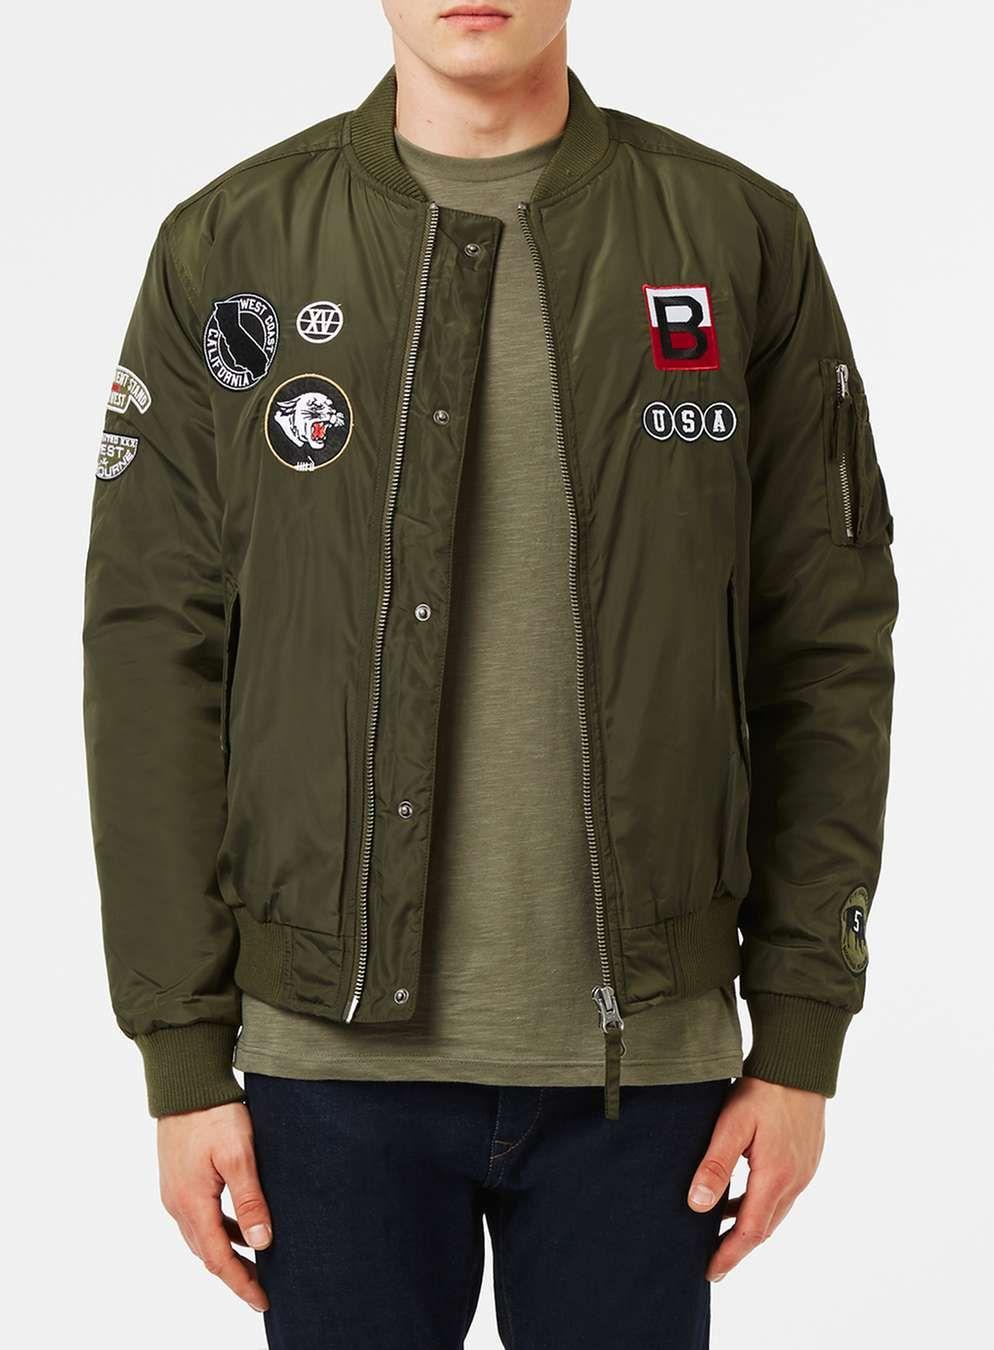 Navy Badge Ma1 Bomber Jacket Mens Flight Jacket Jackets Men Fashion Bomber Jacket [ 1350 x 994 Pixel ]